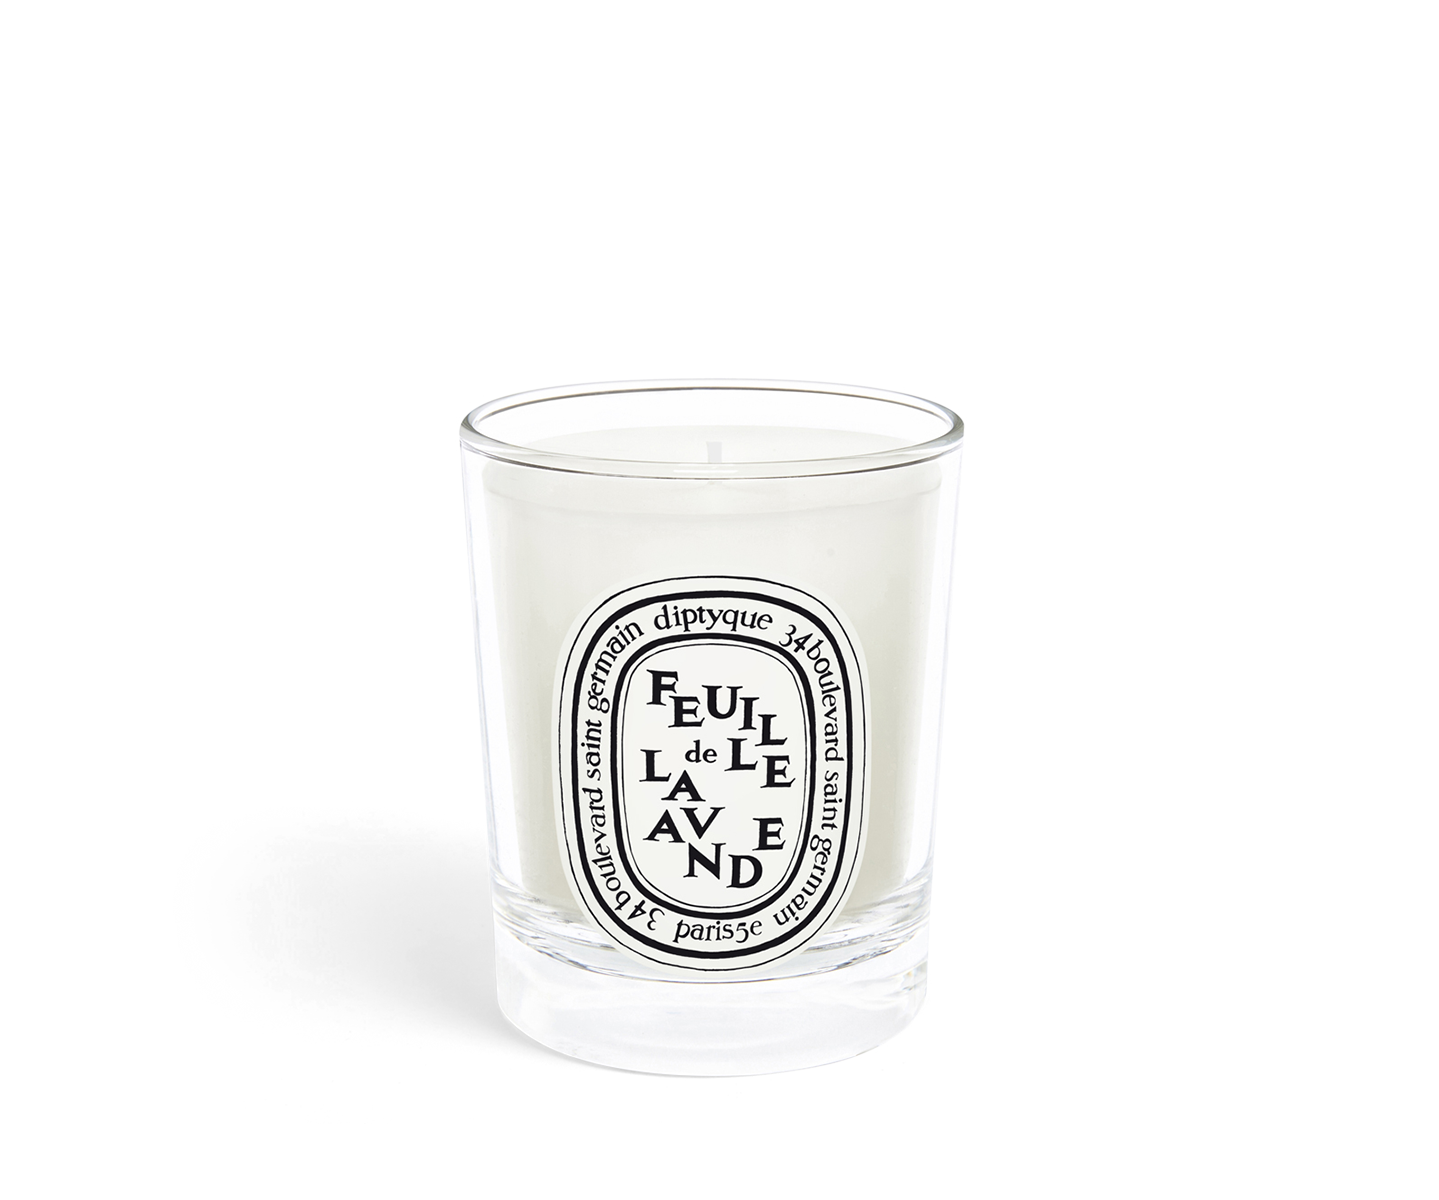 Feuille de Lavande / Lavendar Leaf small candle